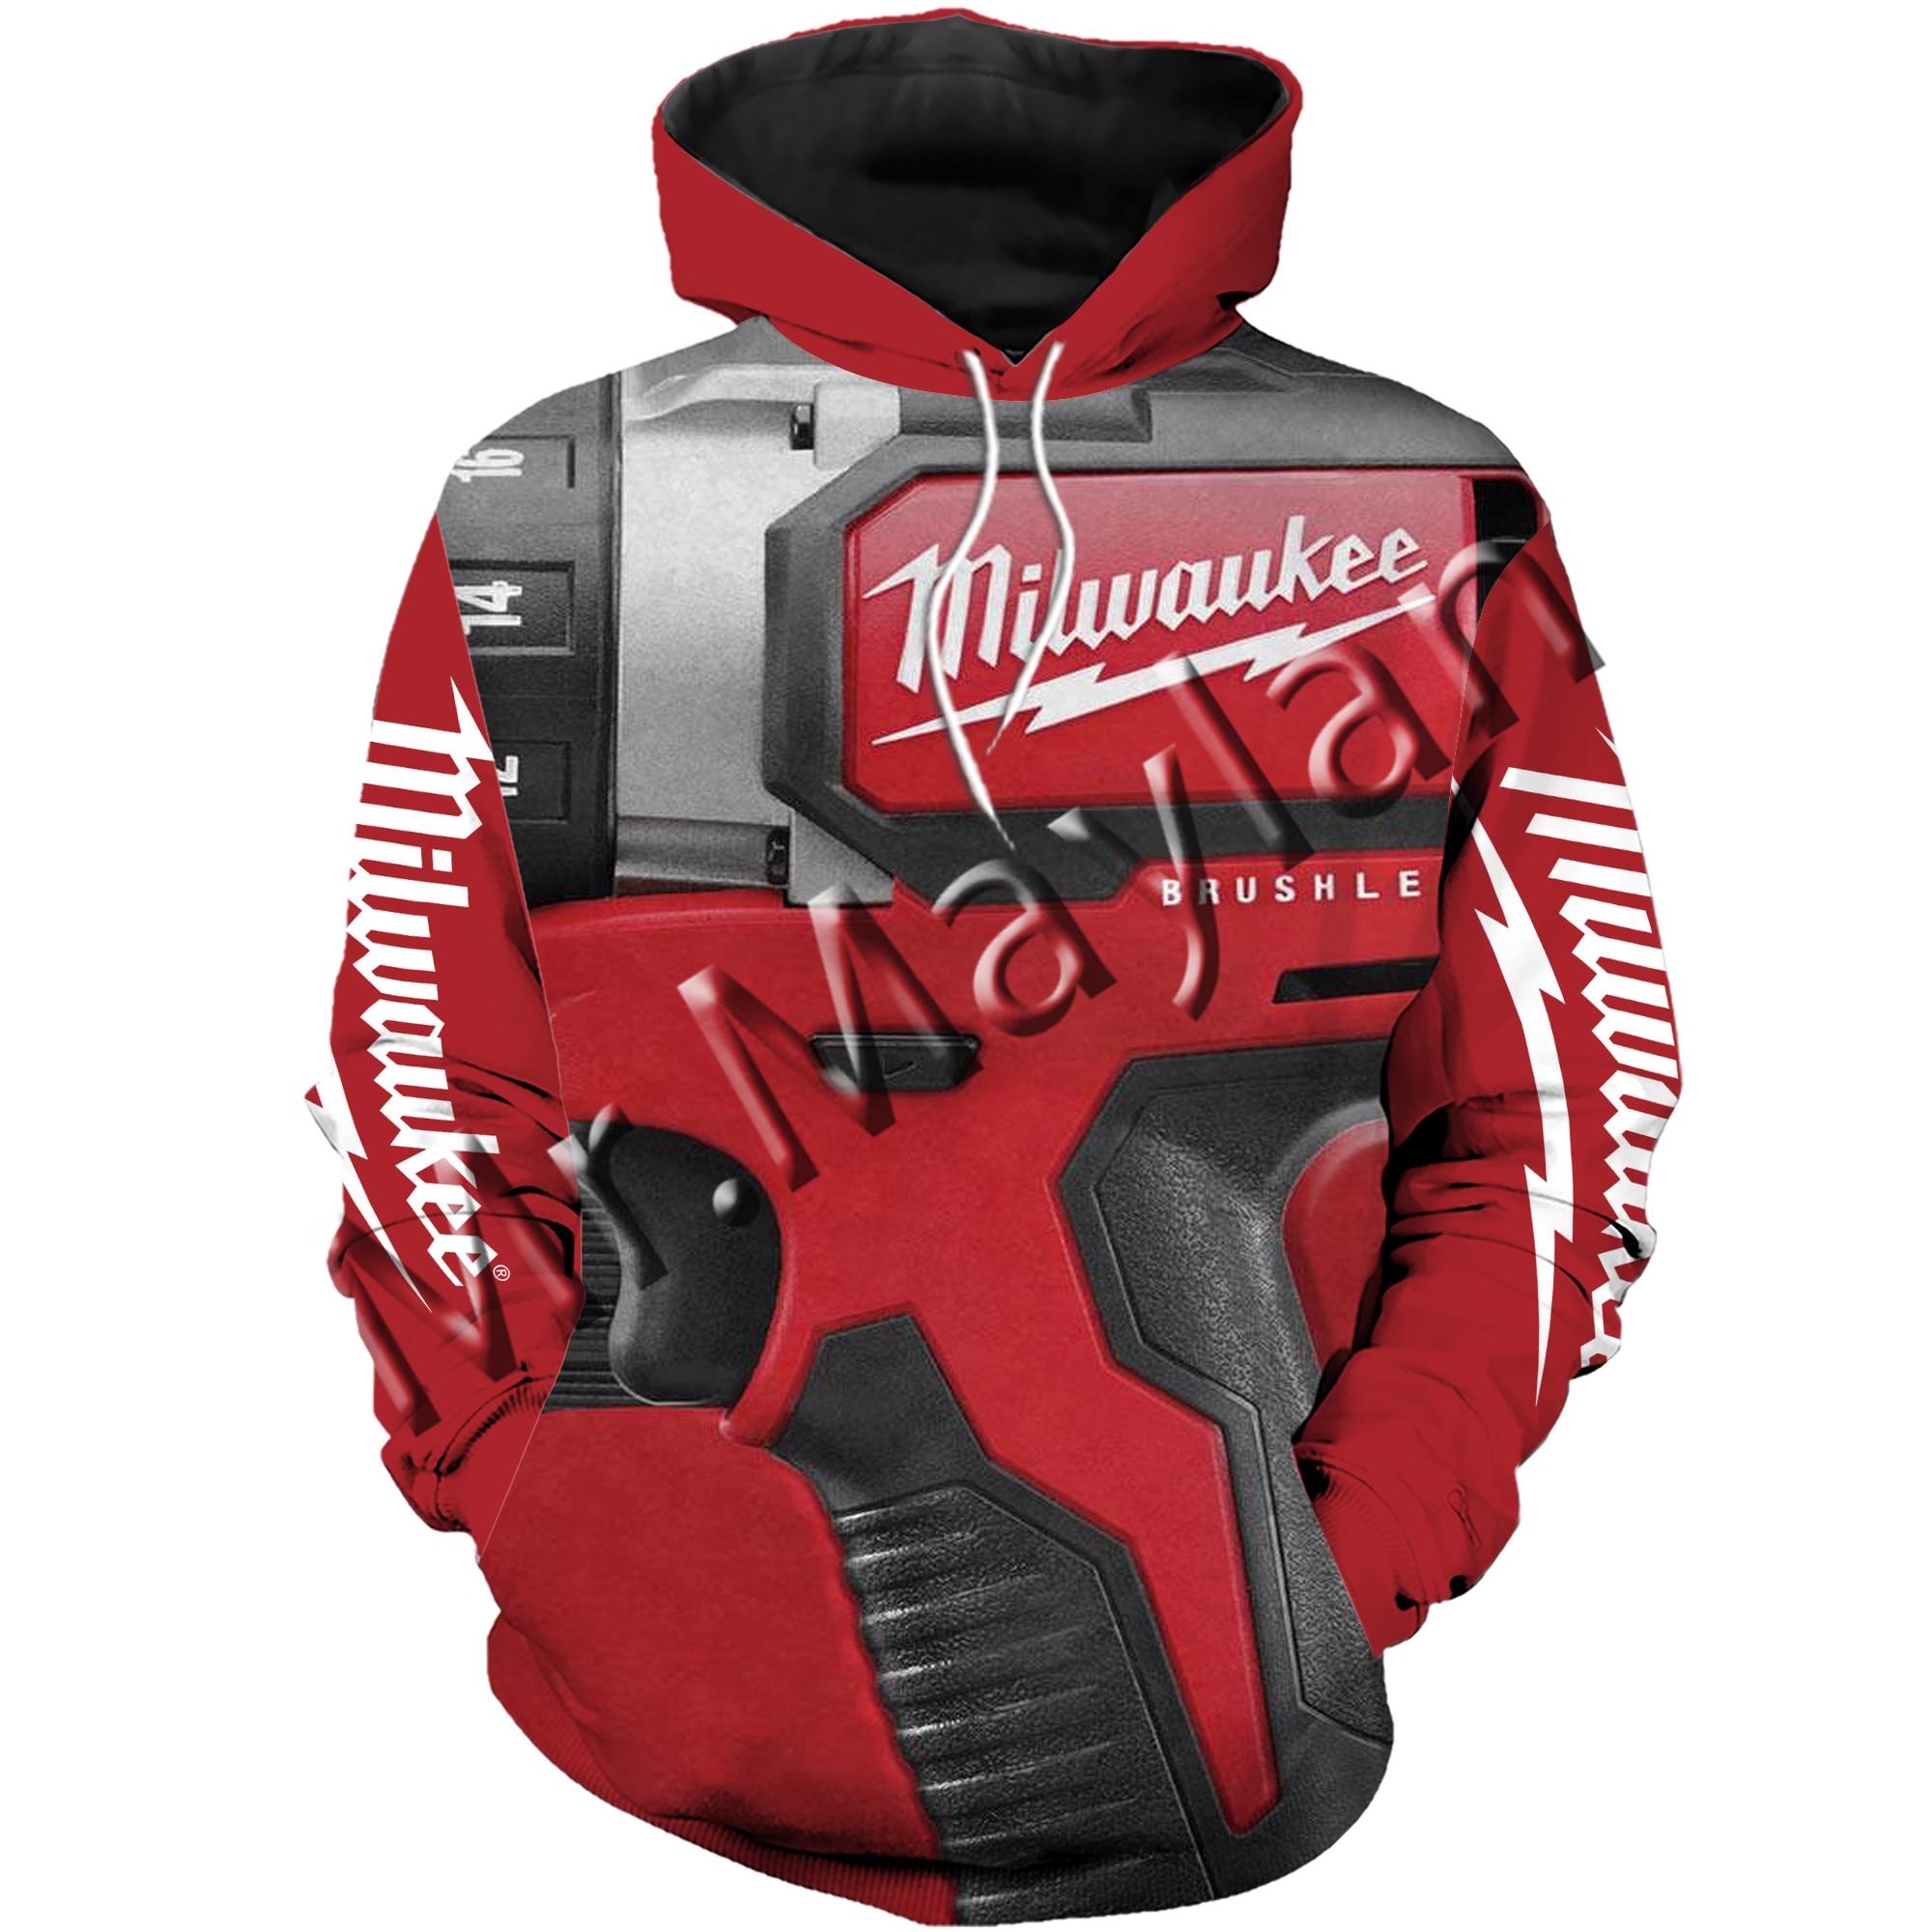 3D Print Fashion Beautiful Milwaukee Tools Men/Women Sportswear Hoodie Leisure Streetwear  / Sweatshirts / Hoodies / Jacket /S-2